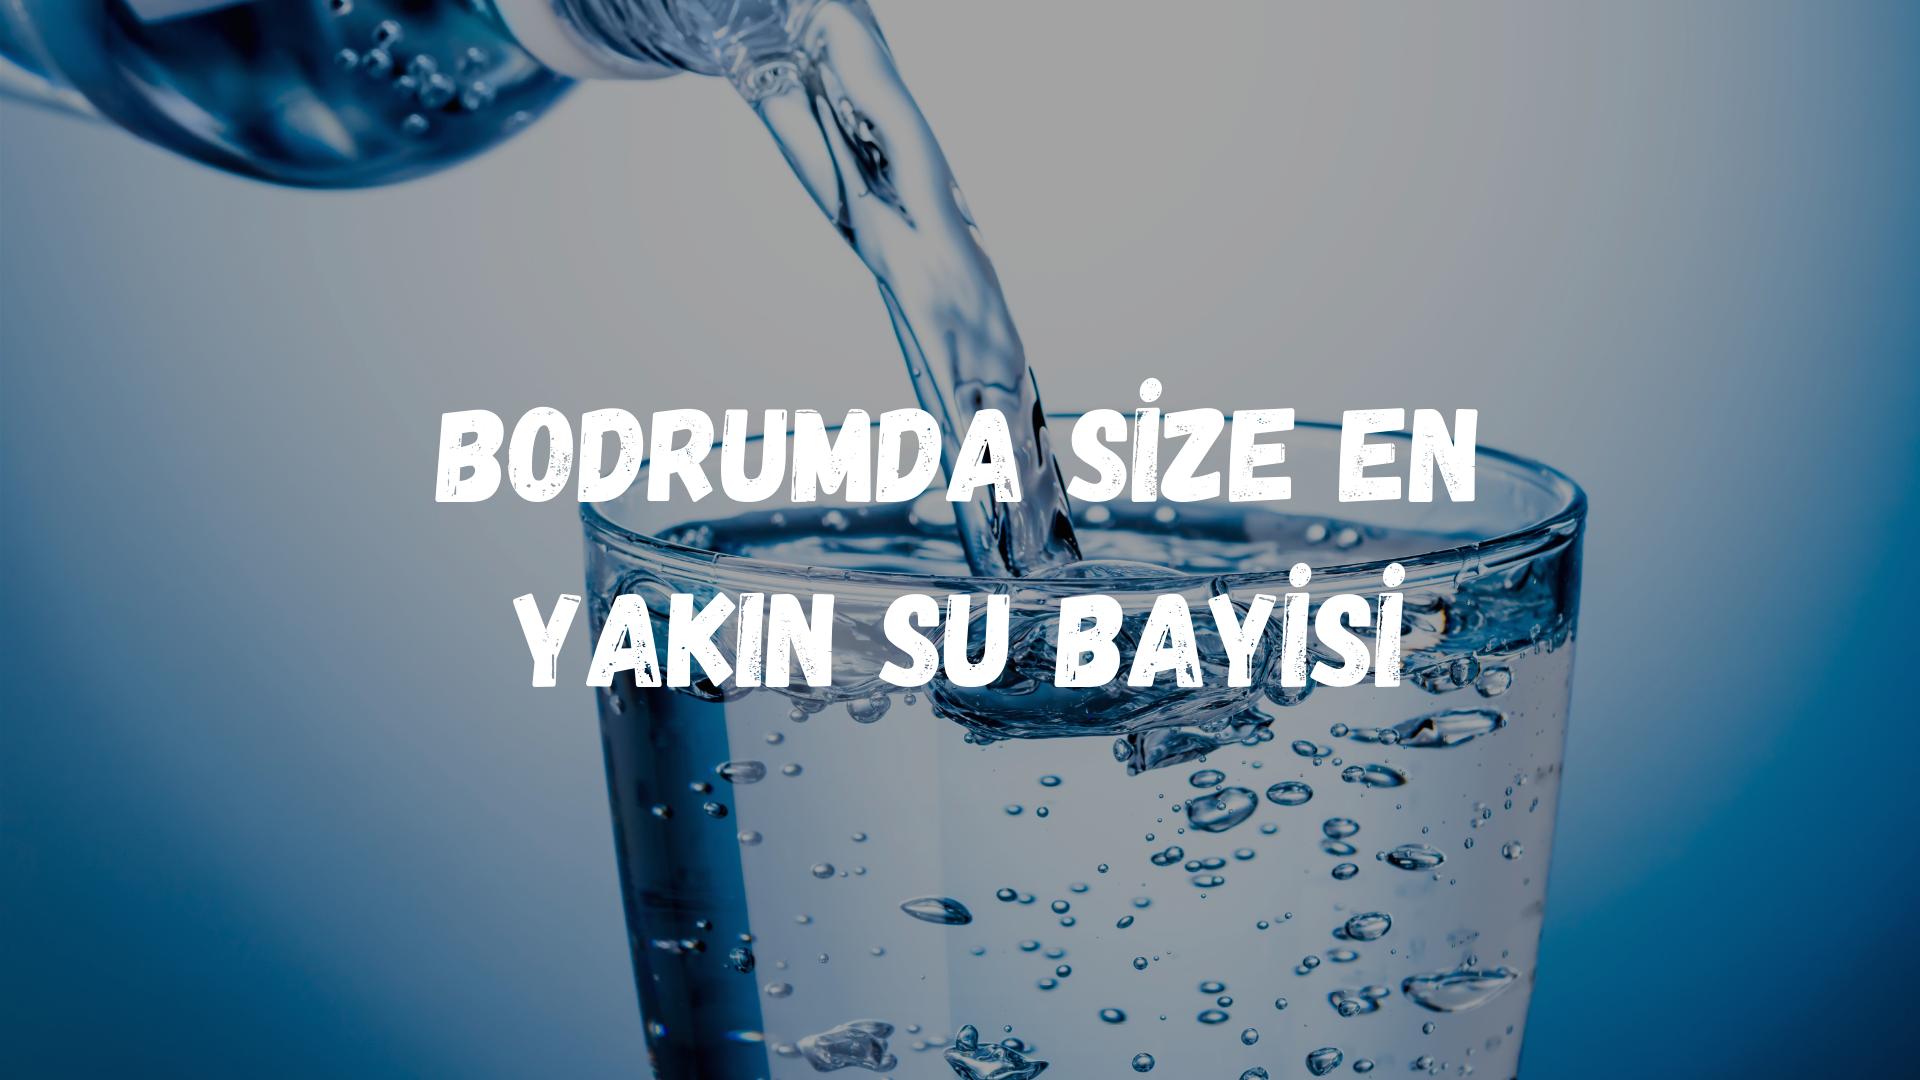 <strong>Bodrum'da Size En Yakın Su Bayisi</strong>